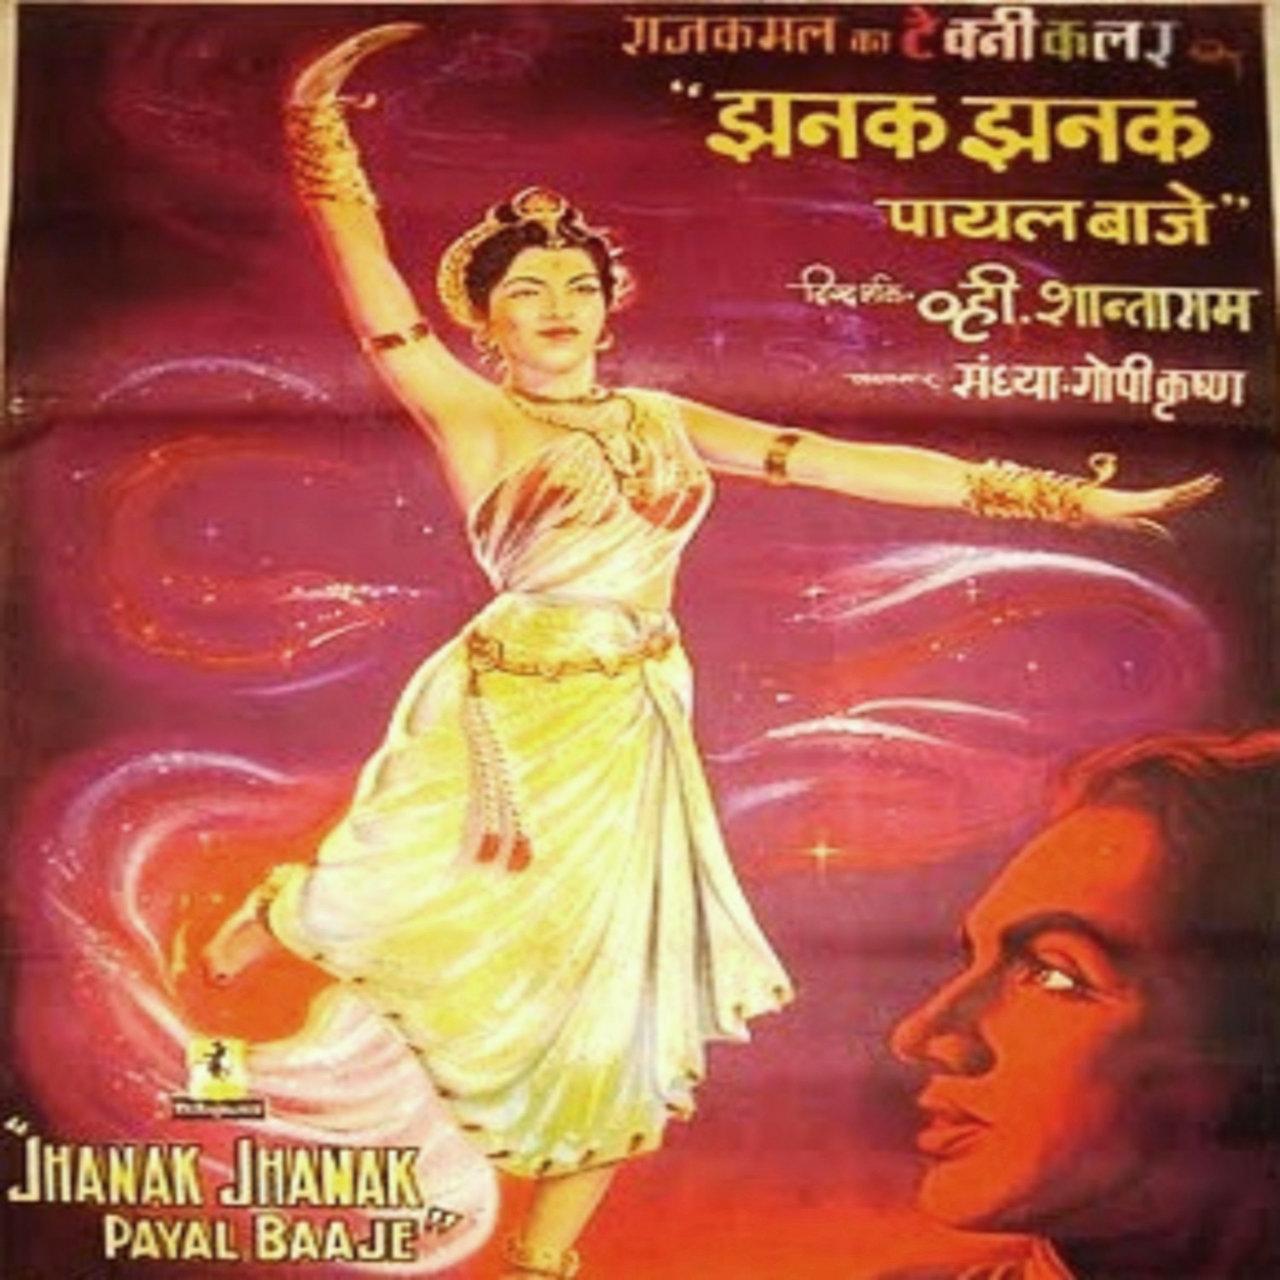 classic movie jhanak jhanak payal baaje filmfare award